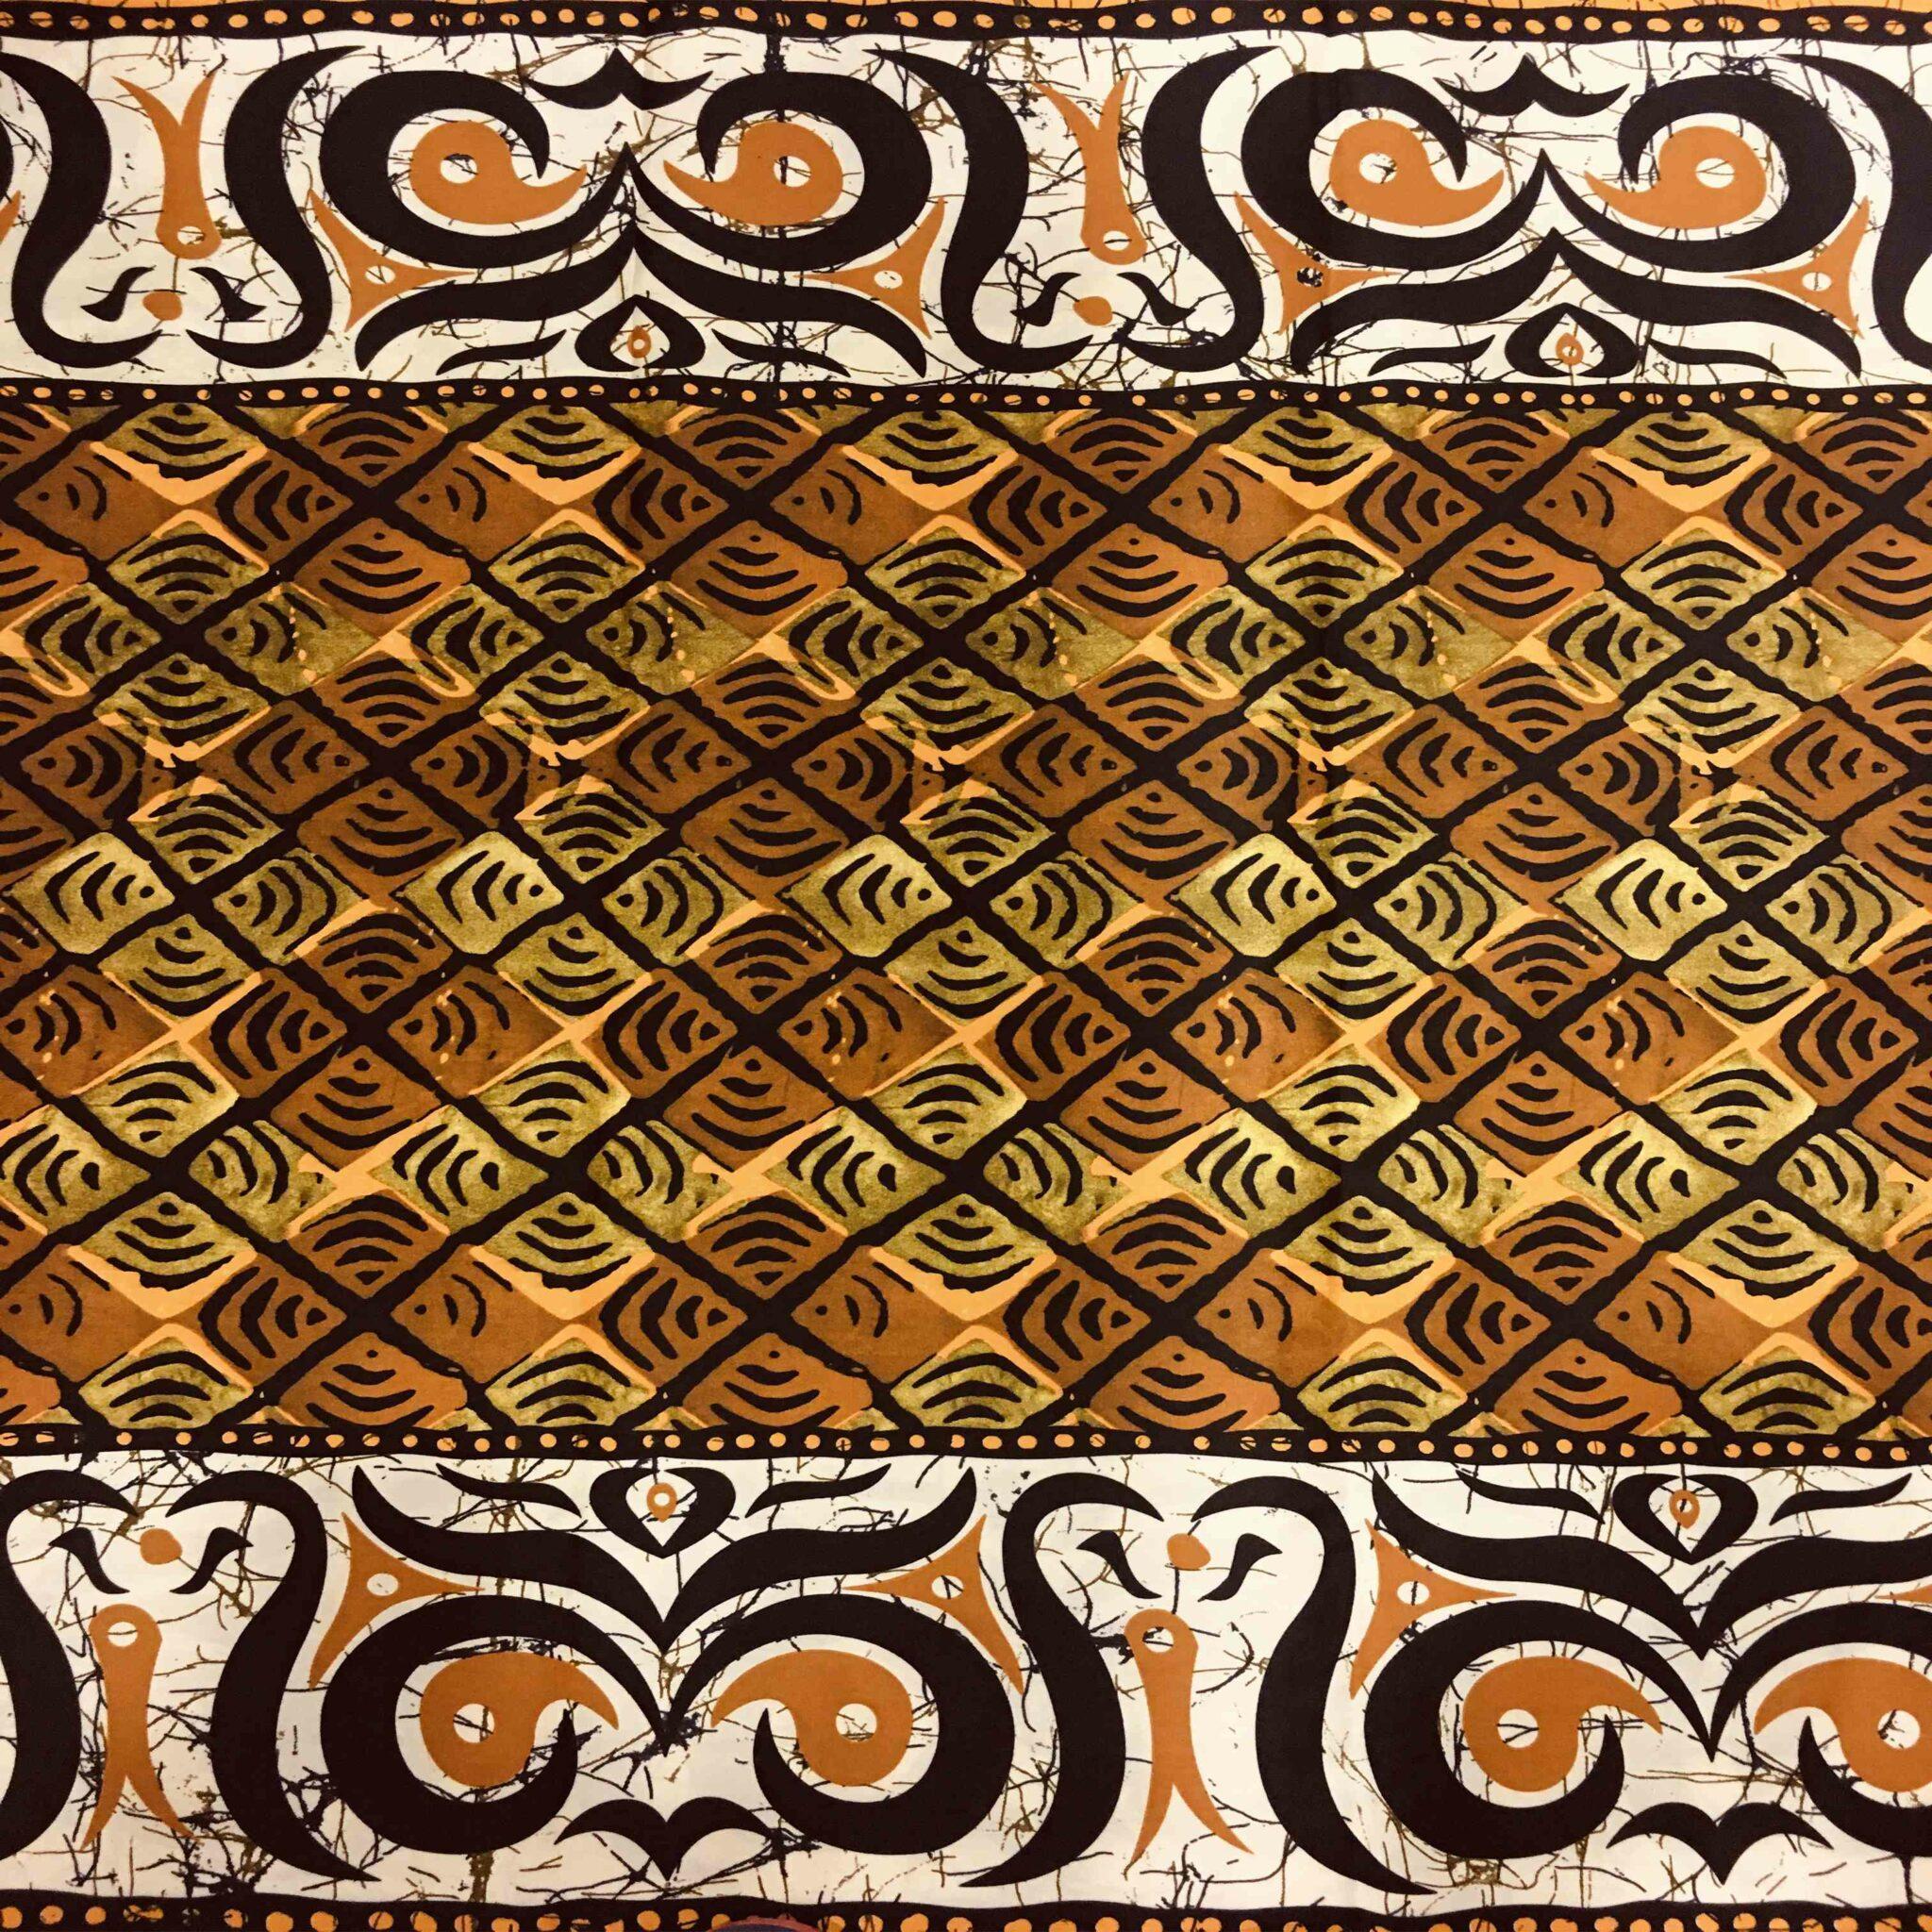 Wax Tissus Africain Grottes Vente Au Metre Tissus Lionel